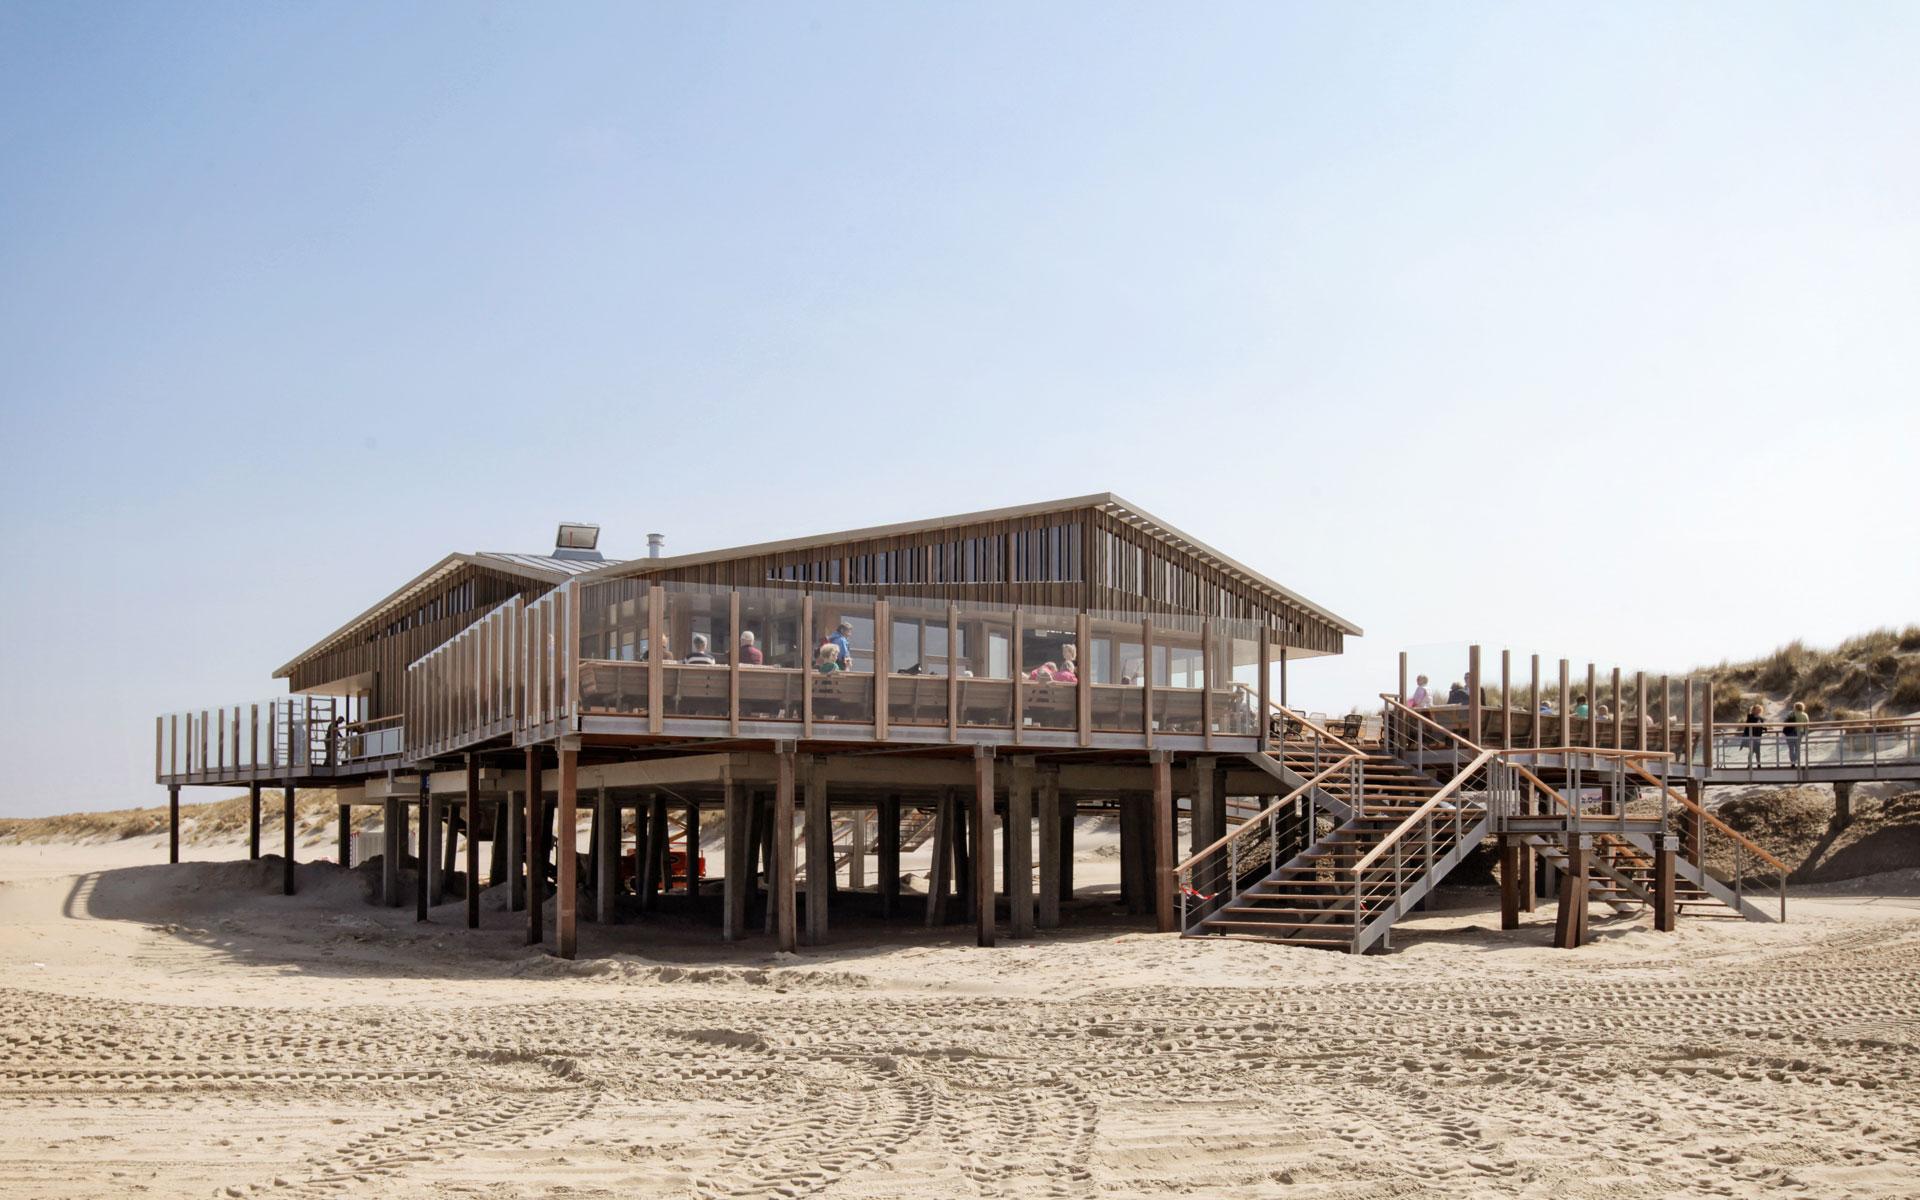 Paviljoen Sjoerd Ameland - BINT architecten